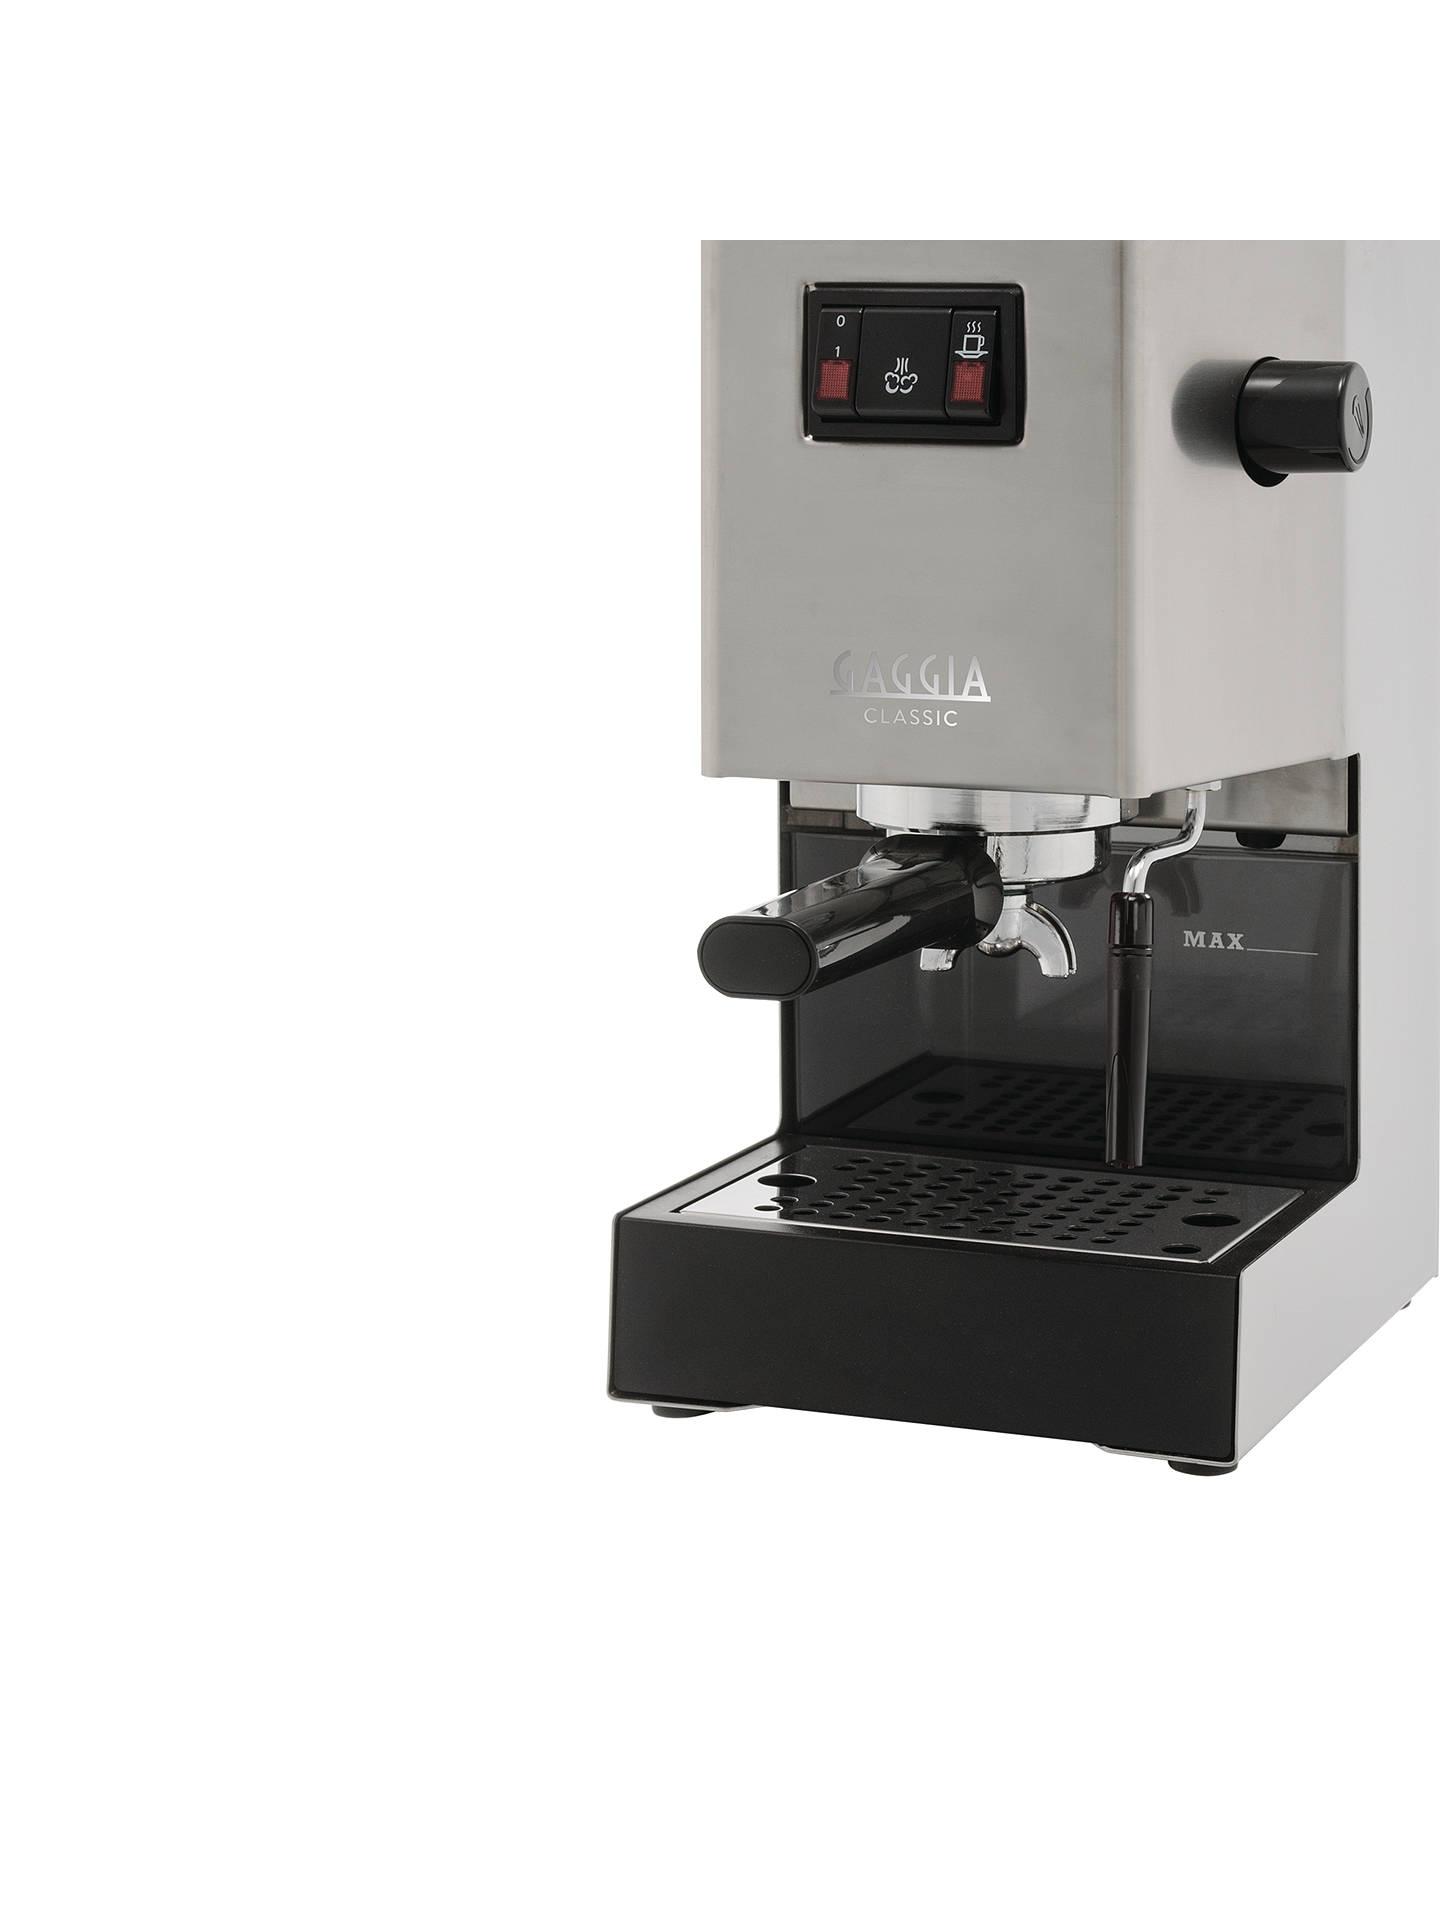 Gaggia Ri816140 Classic Manual Espresso Machine Stainless Steel At